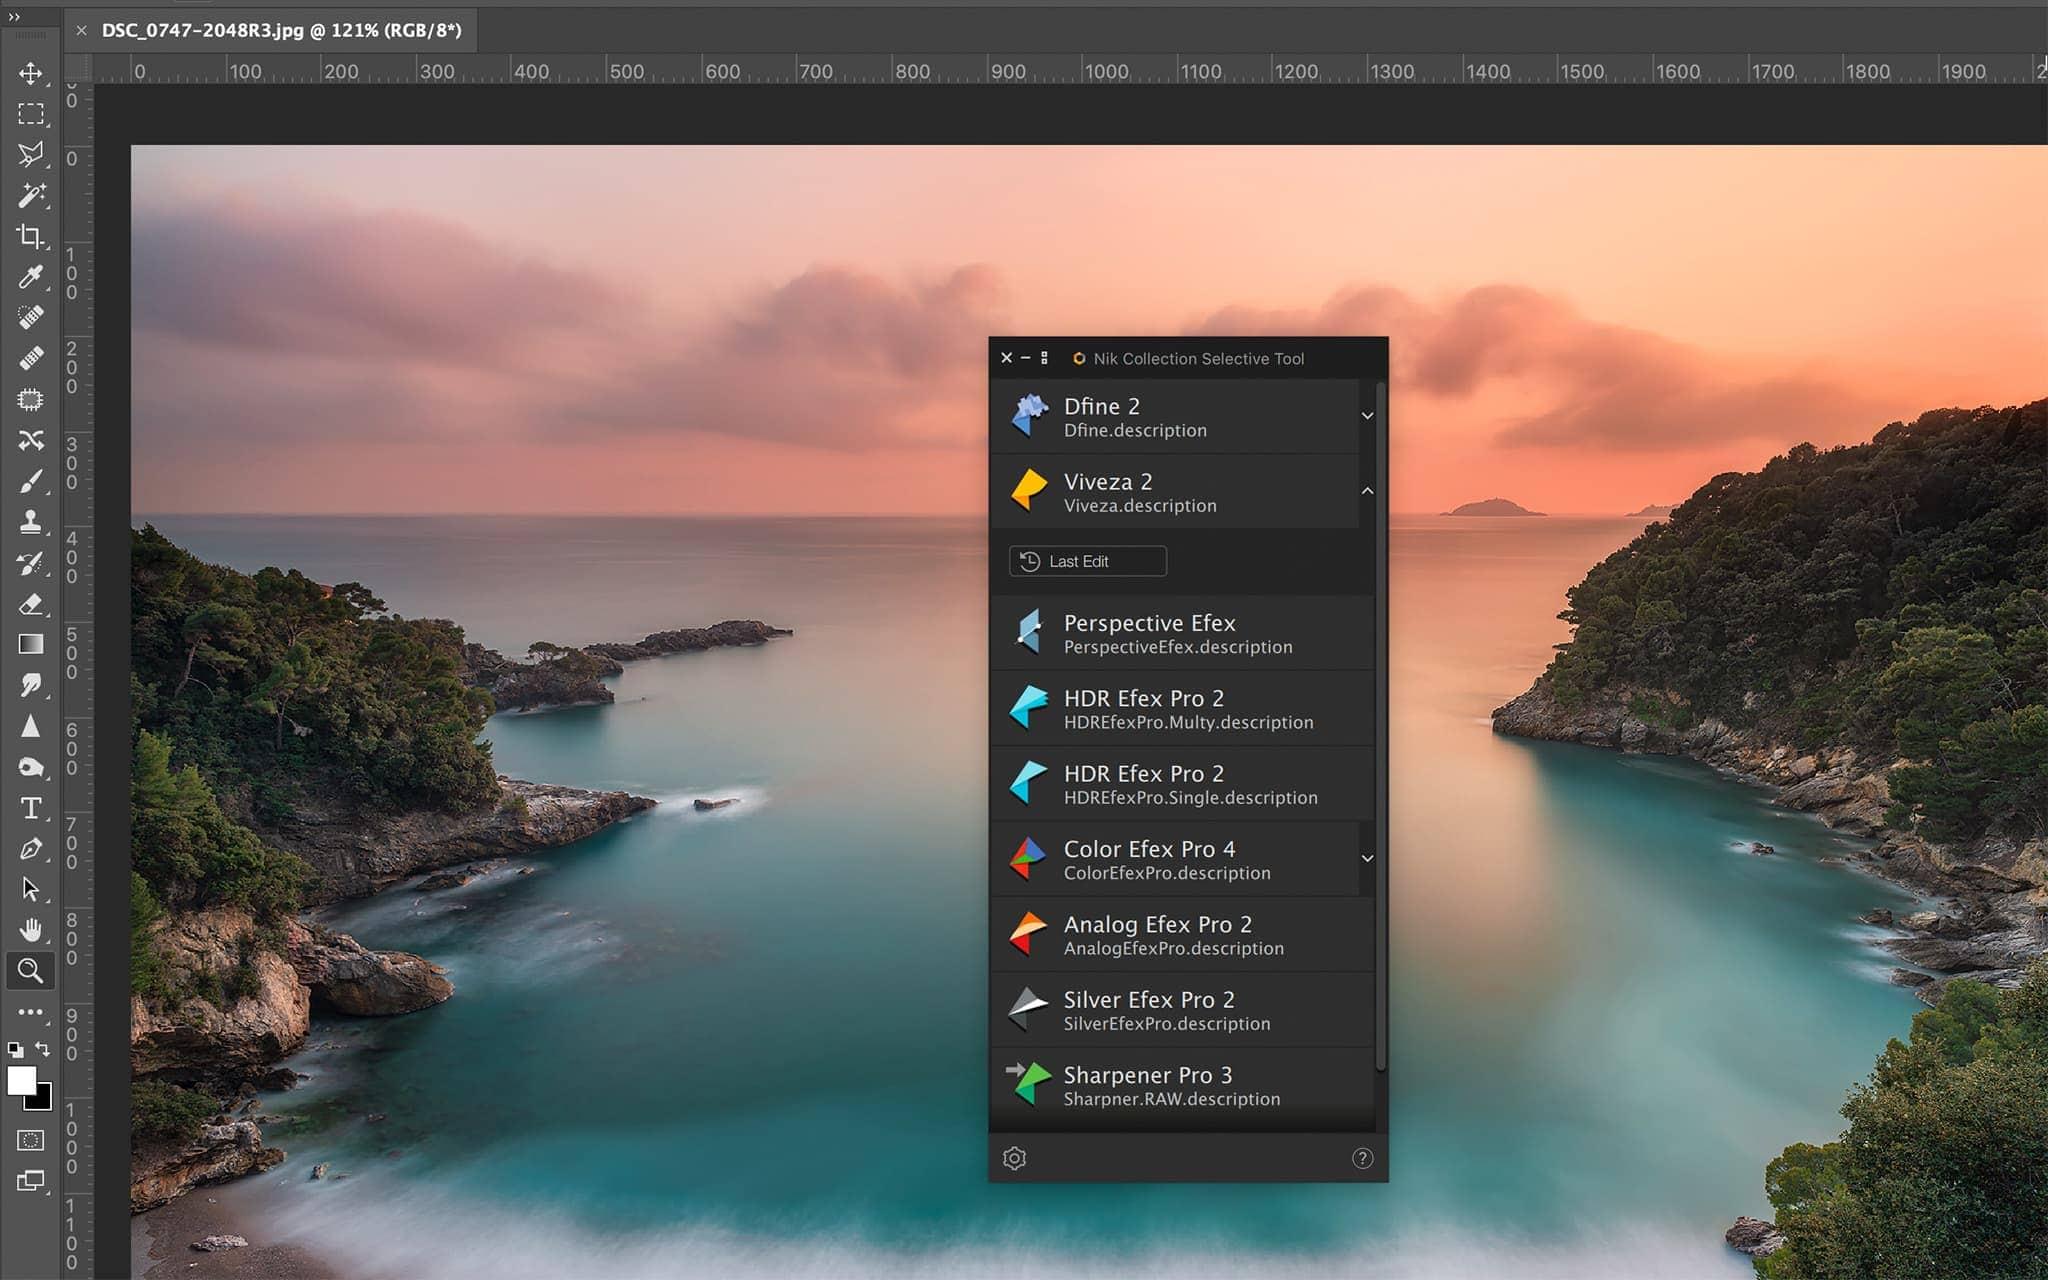 Nik Collection 3 DxO Selective Tool New